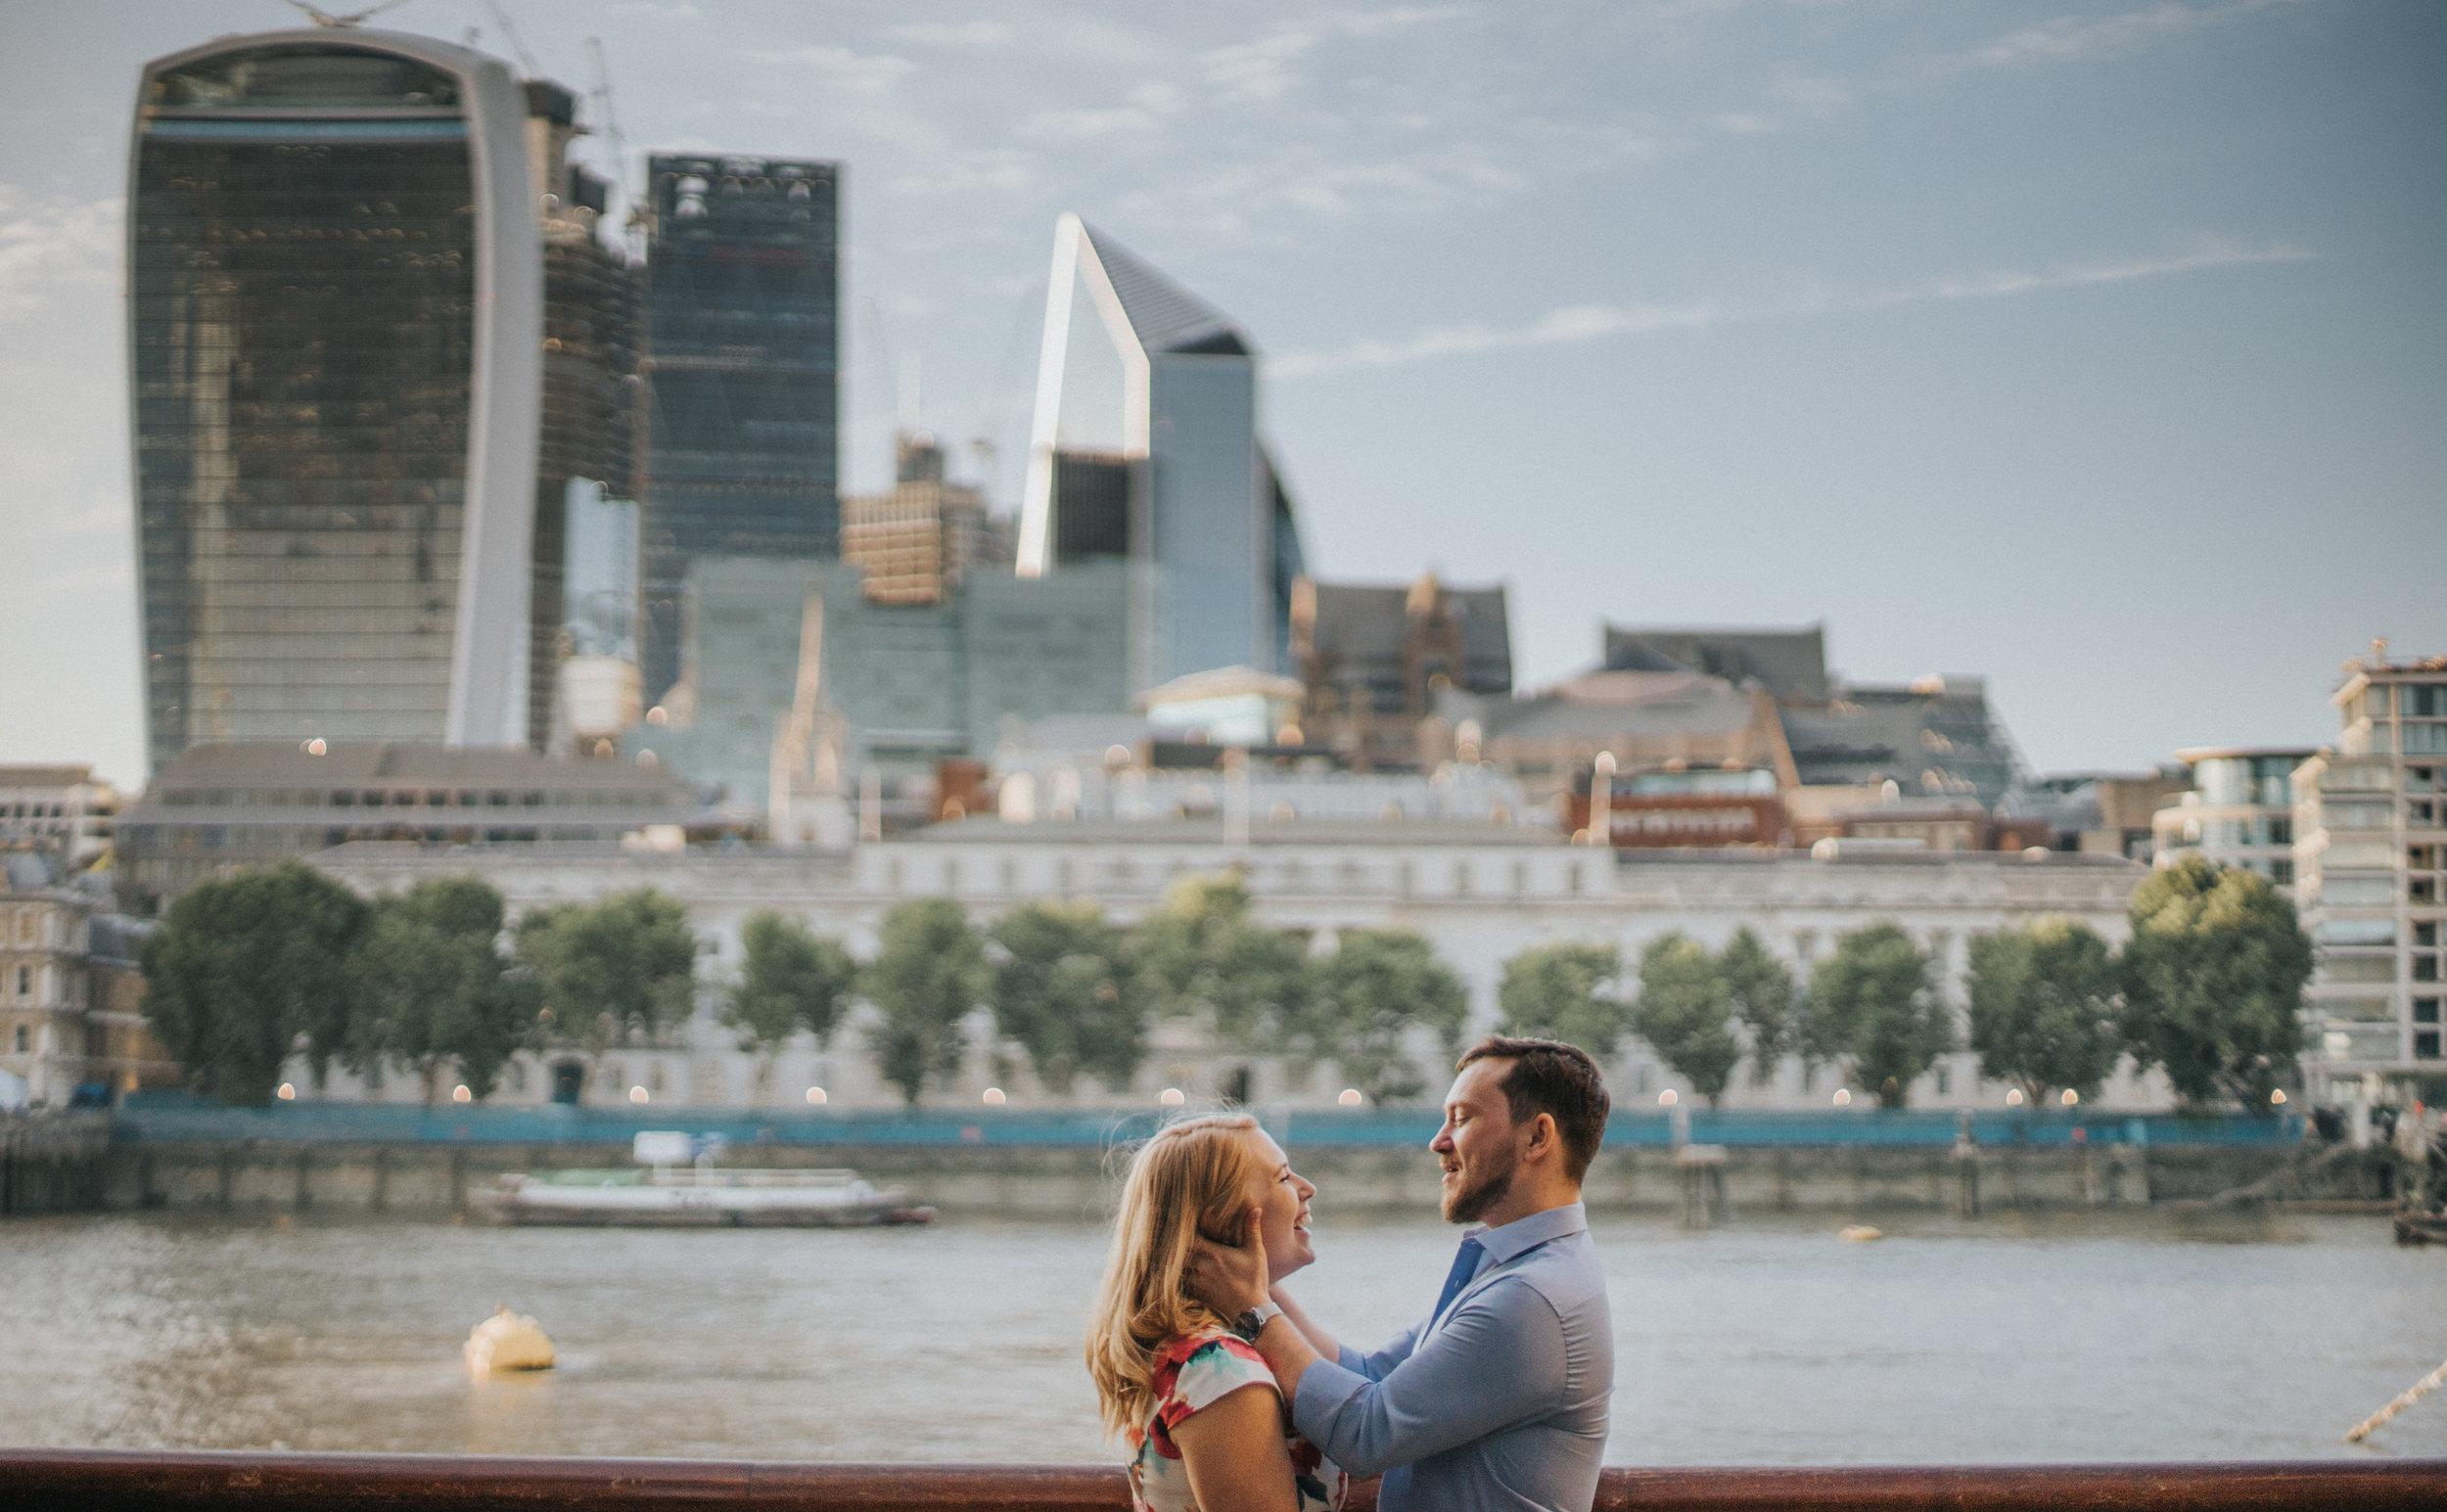 borough-market-london-bridge-engagement-wedding-london-photography-videography-11